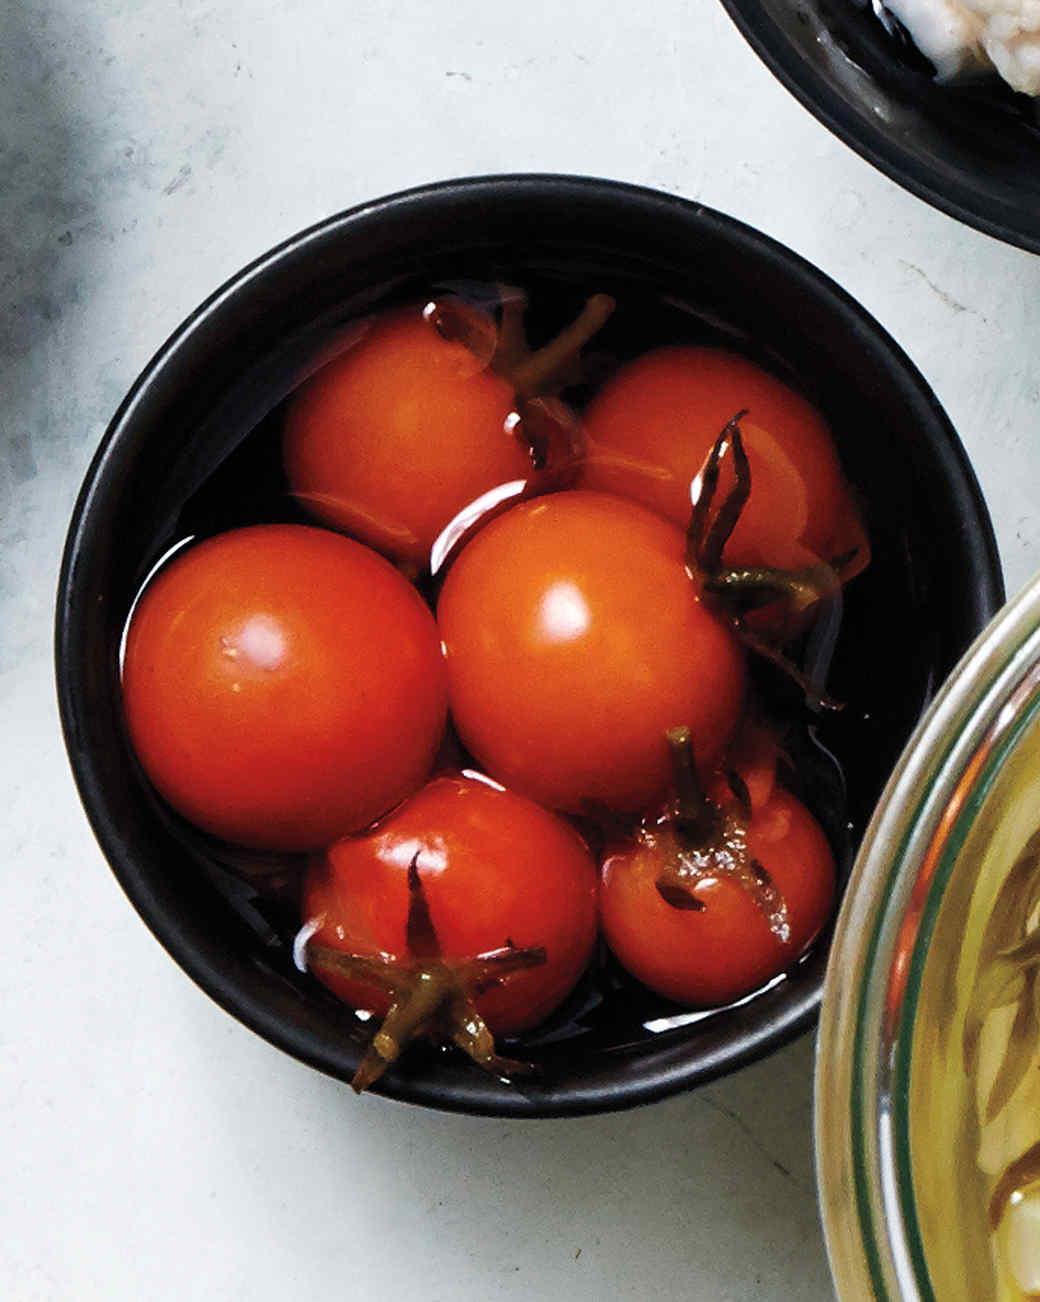 tomatoes-pickled-404-d111614-0915.jpg